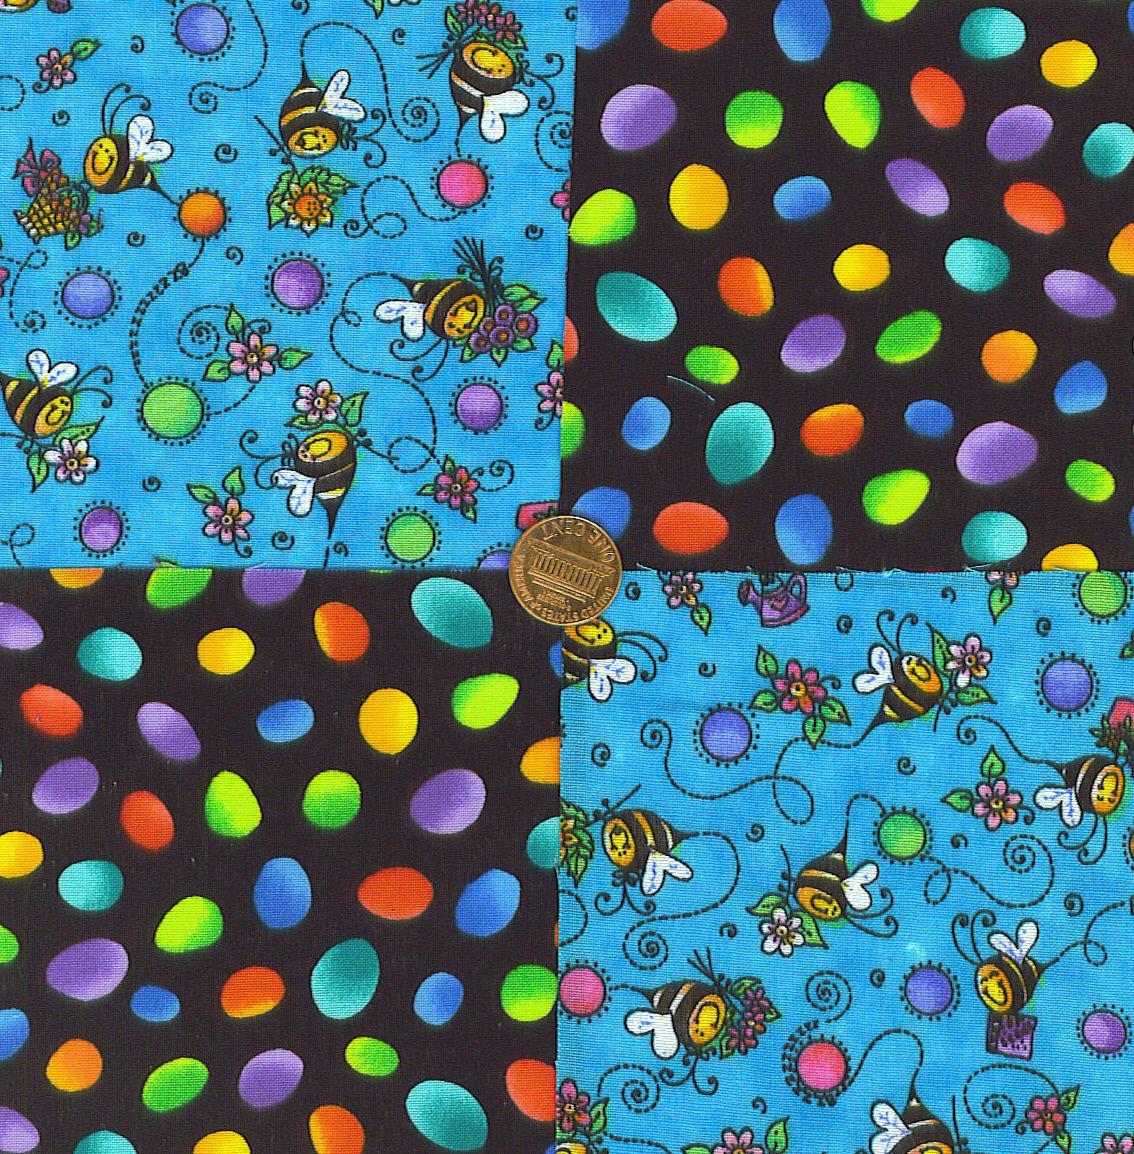 Sweet Smiling Bee Rainbow Dots 100% Cotton Fabric Squares  Blocks my3